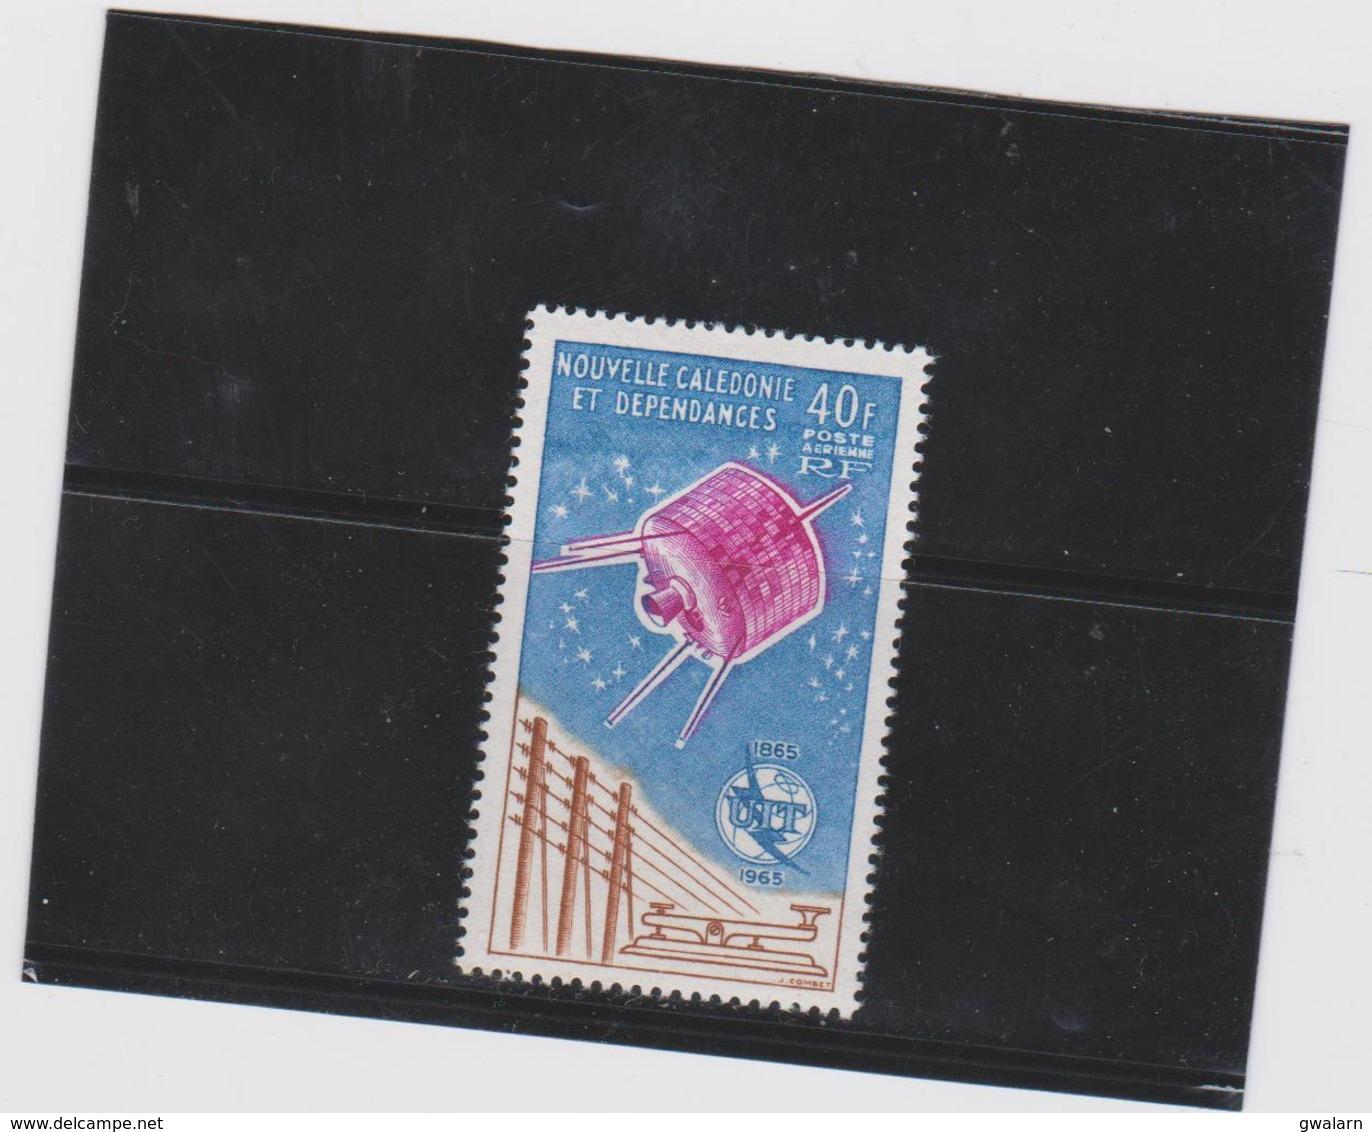 NOUVELLE CALEDONIE 1 T Poste Aérienne Neuf Xx  N°YT PA 80 - 1965 - Neufs